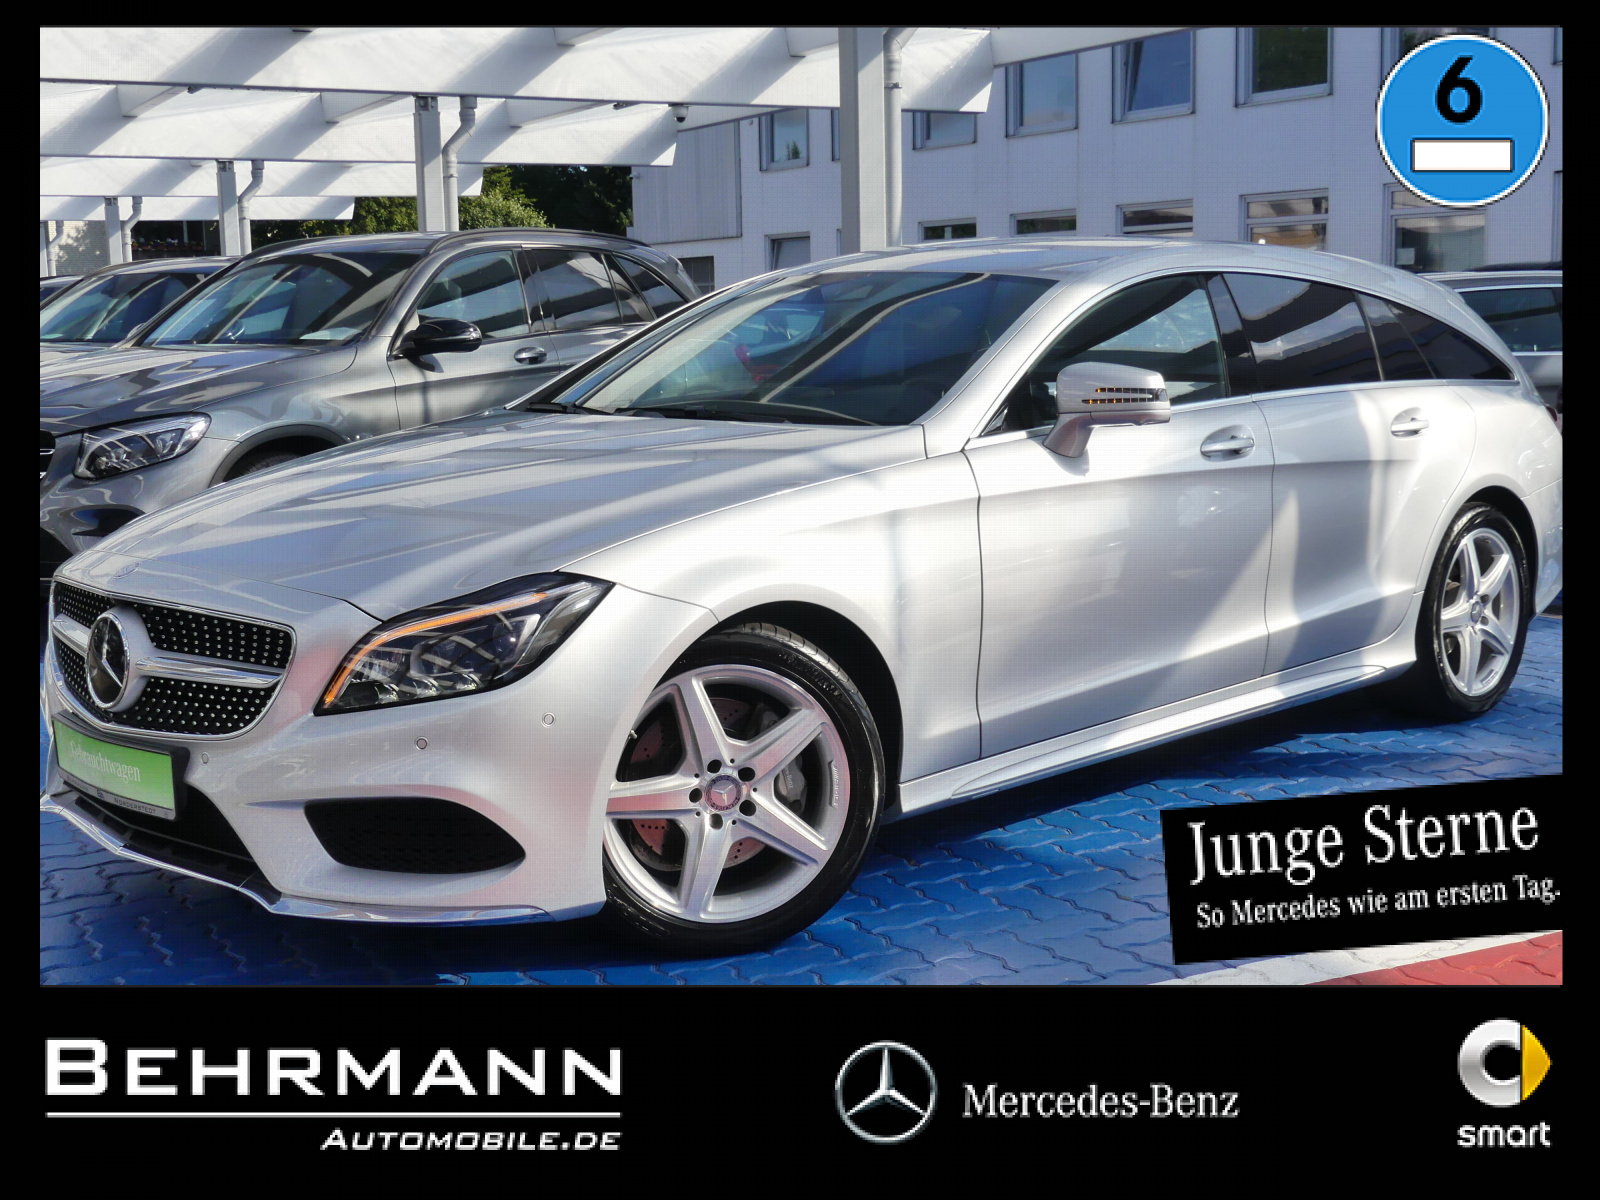 Mercedes-Benz CLS 400 Shooting Brake +AMG+360°Kamera+Distronic, Jahr 2015, Benzin